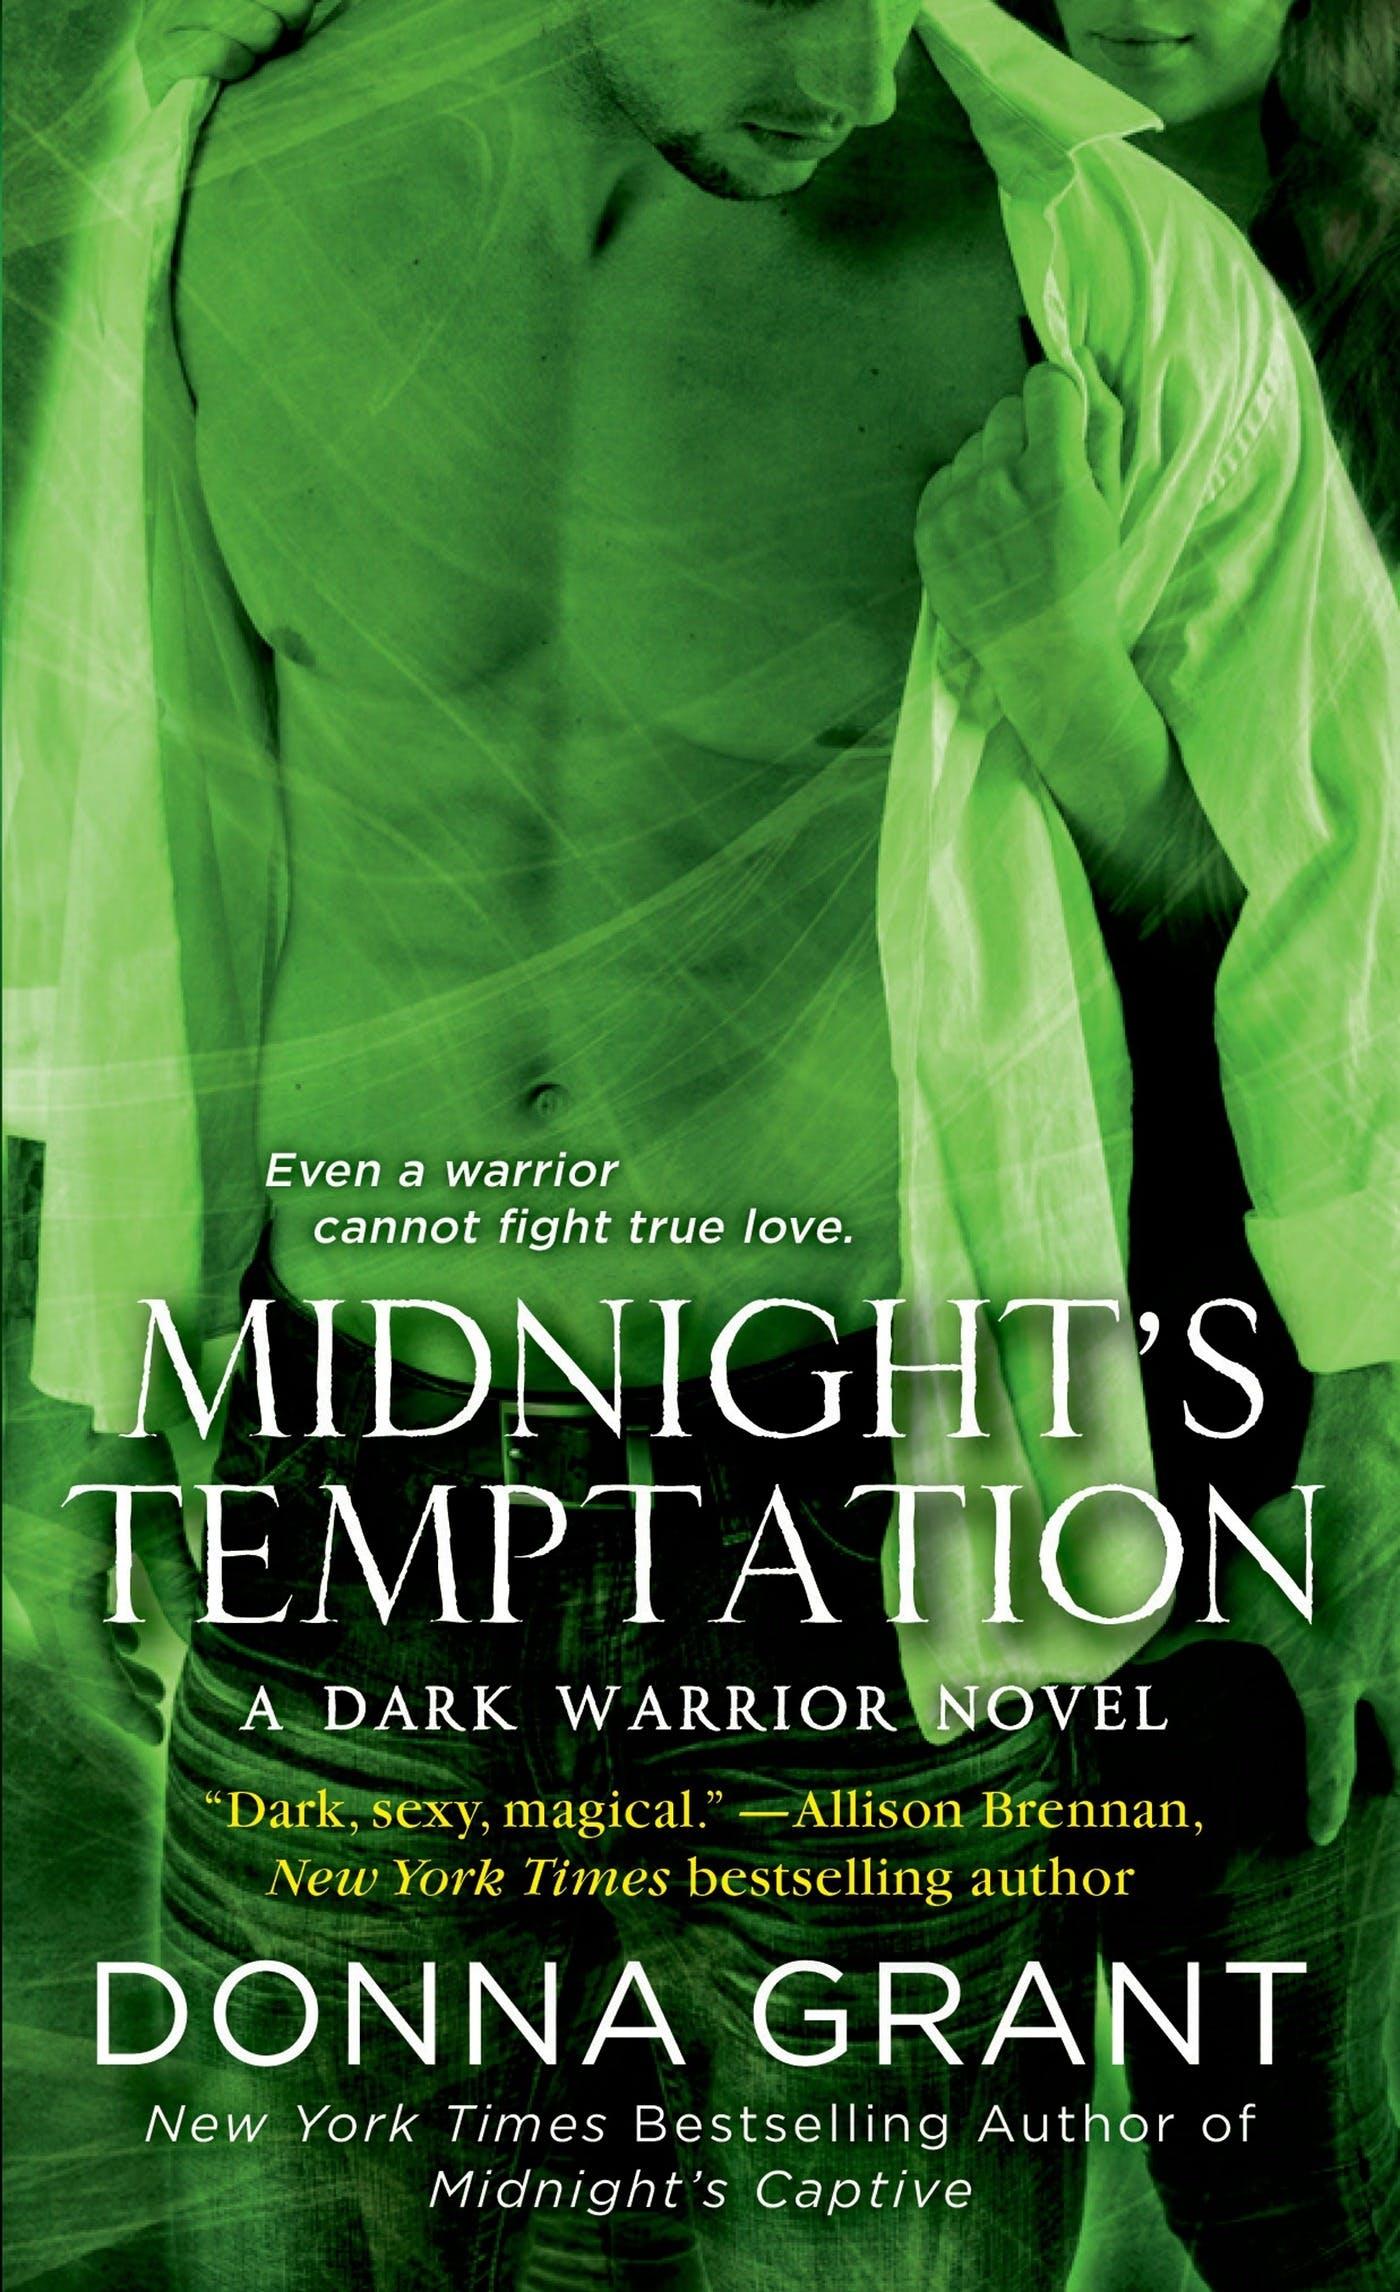 Image of Midnight's Temptation